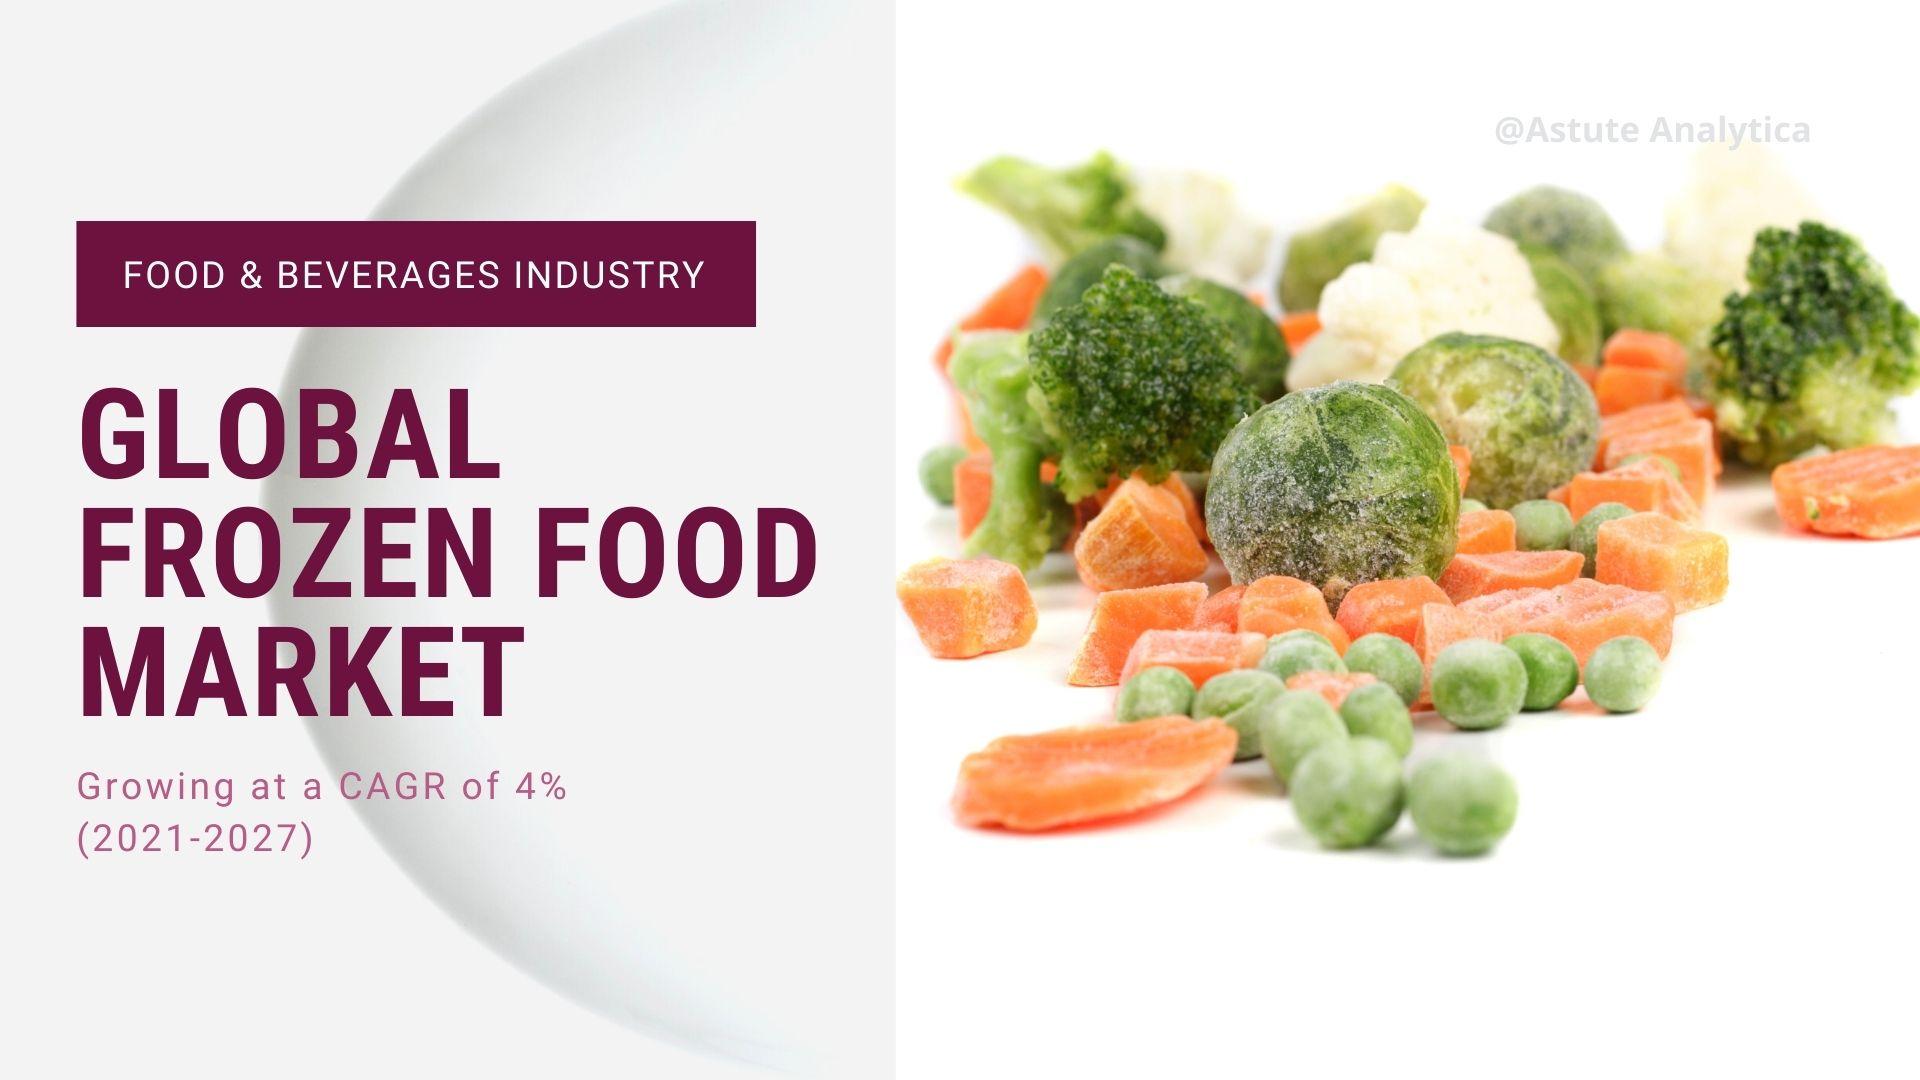 Frozen food market to make great impact in near future